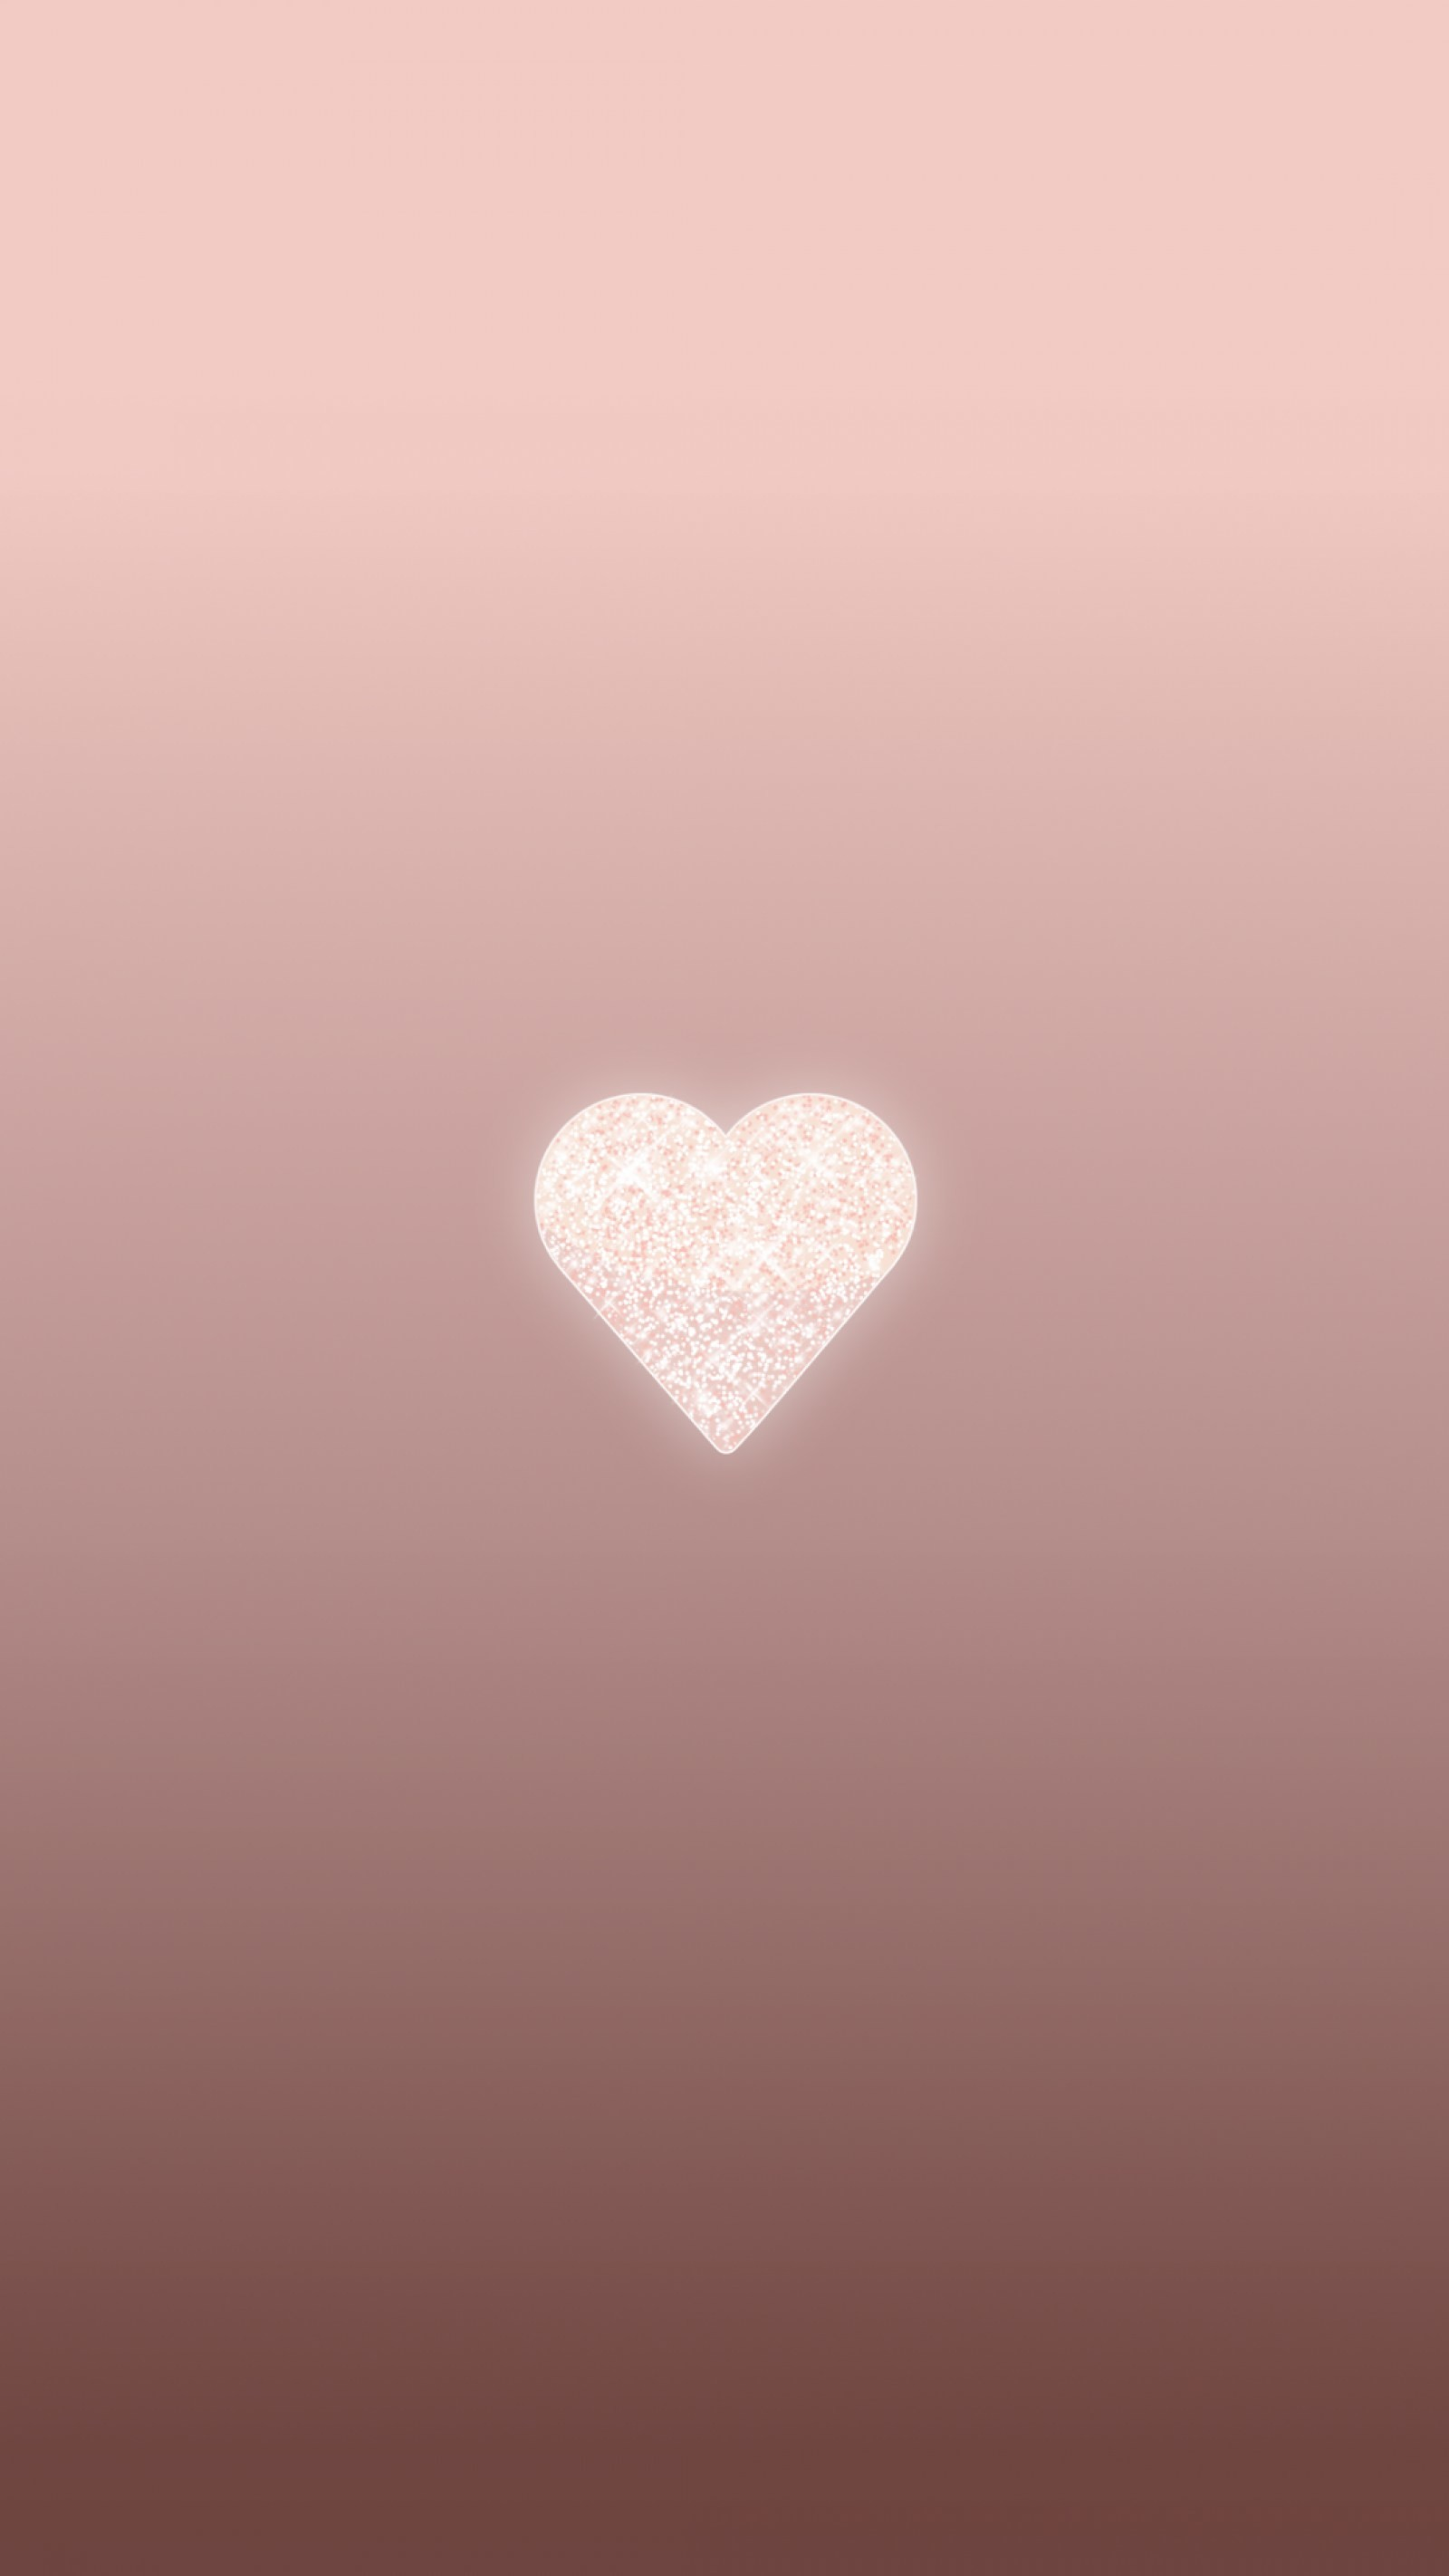 Rose Gold Heart, Phone Wallpaper, Background, Lock - Lock Screen Rose Gold - HD Wallpaper